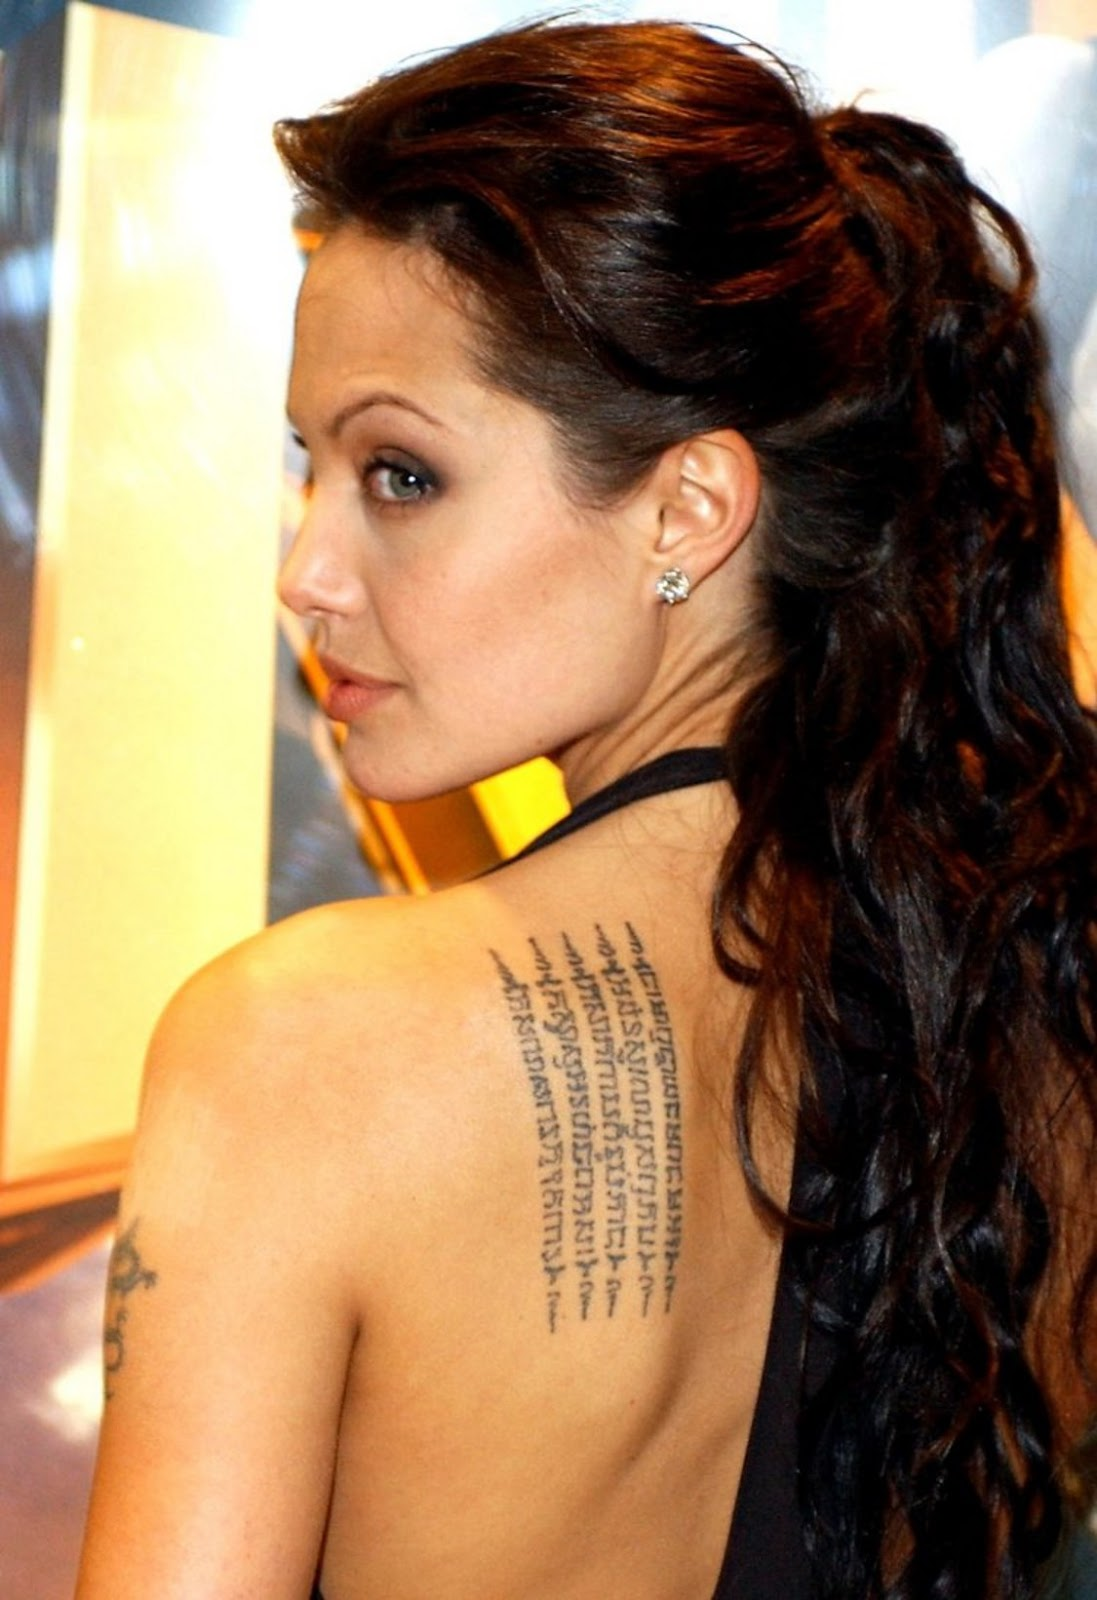 Angelina Jolie Tattoos | Hollywood & Bollywood Celebrity